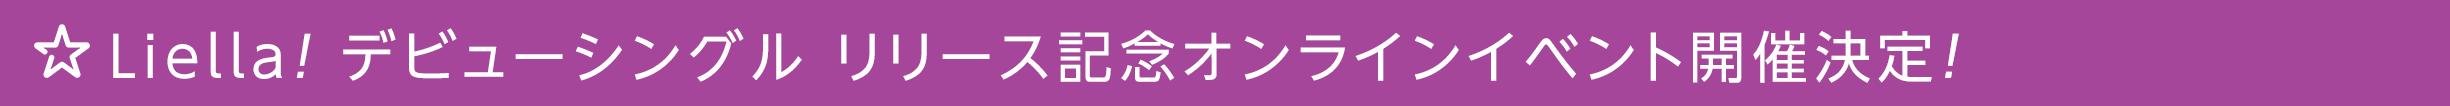 Liella! 1stシングル リリースイベント開催決定!